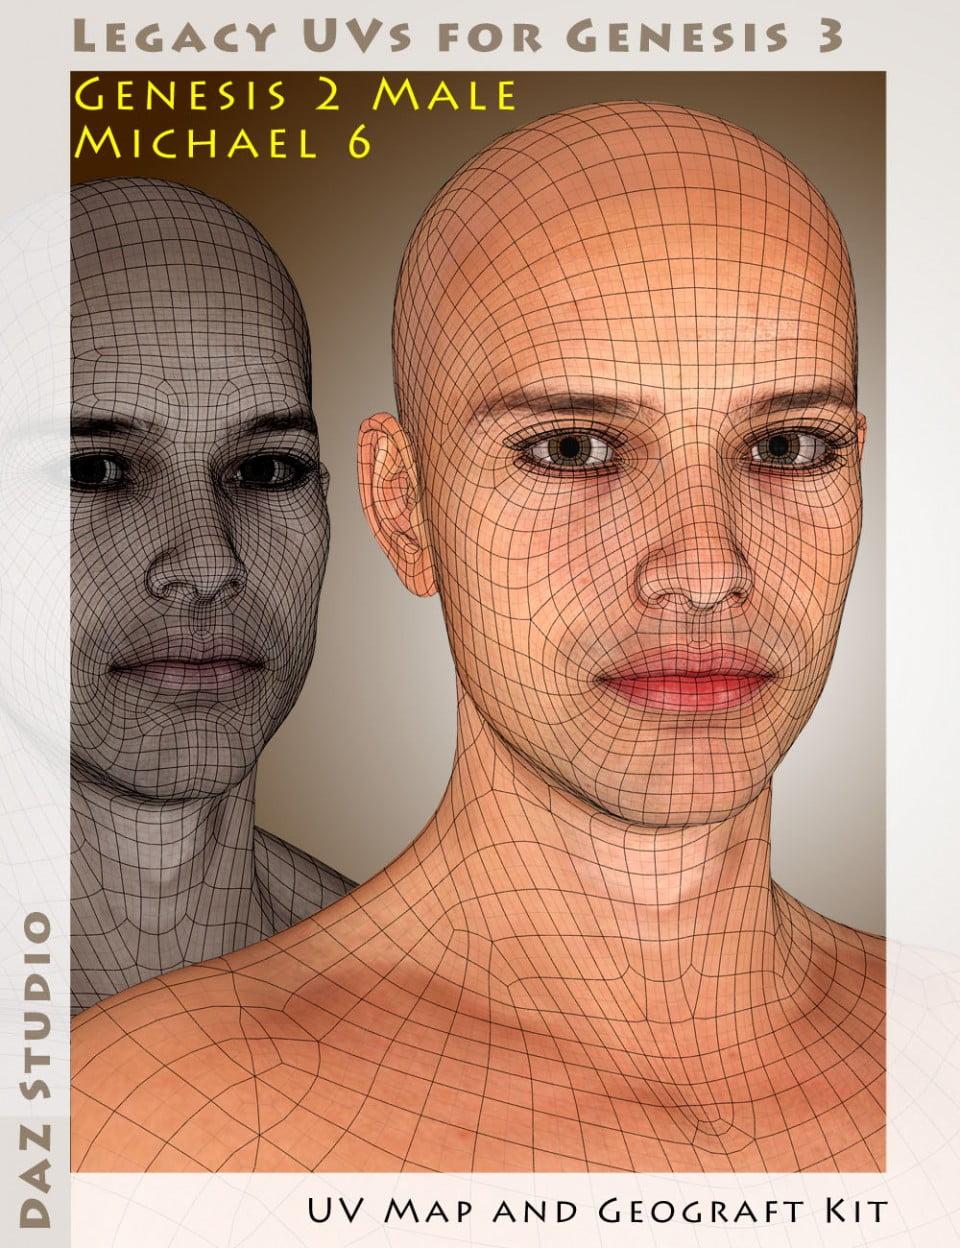 Legacy UVs for Genesis 3: Genesis 2 Male and Michael 6